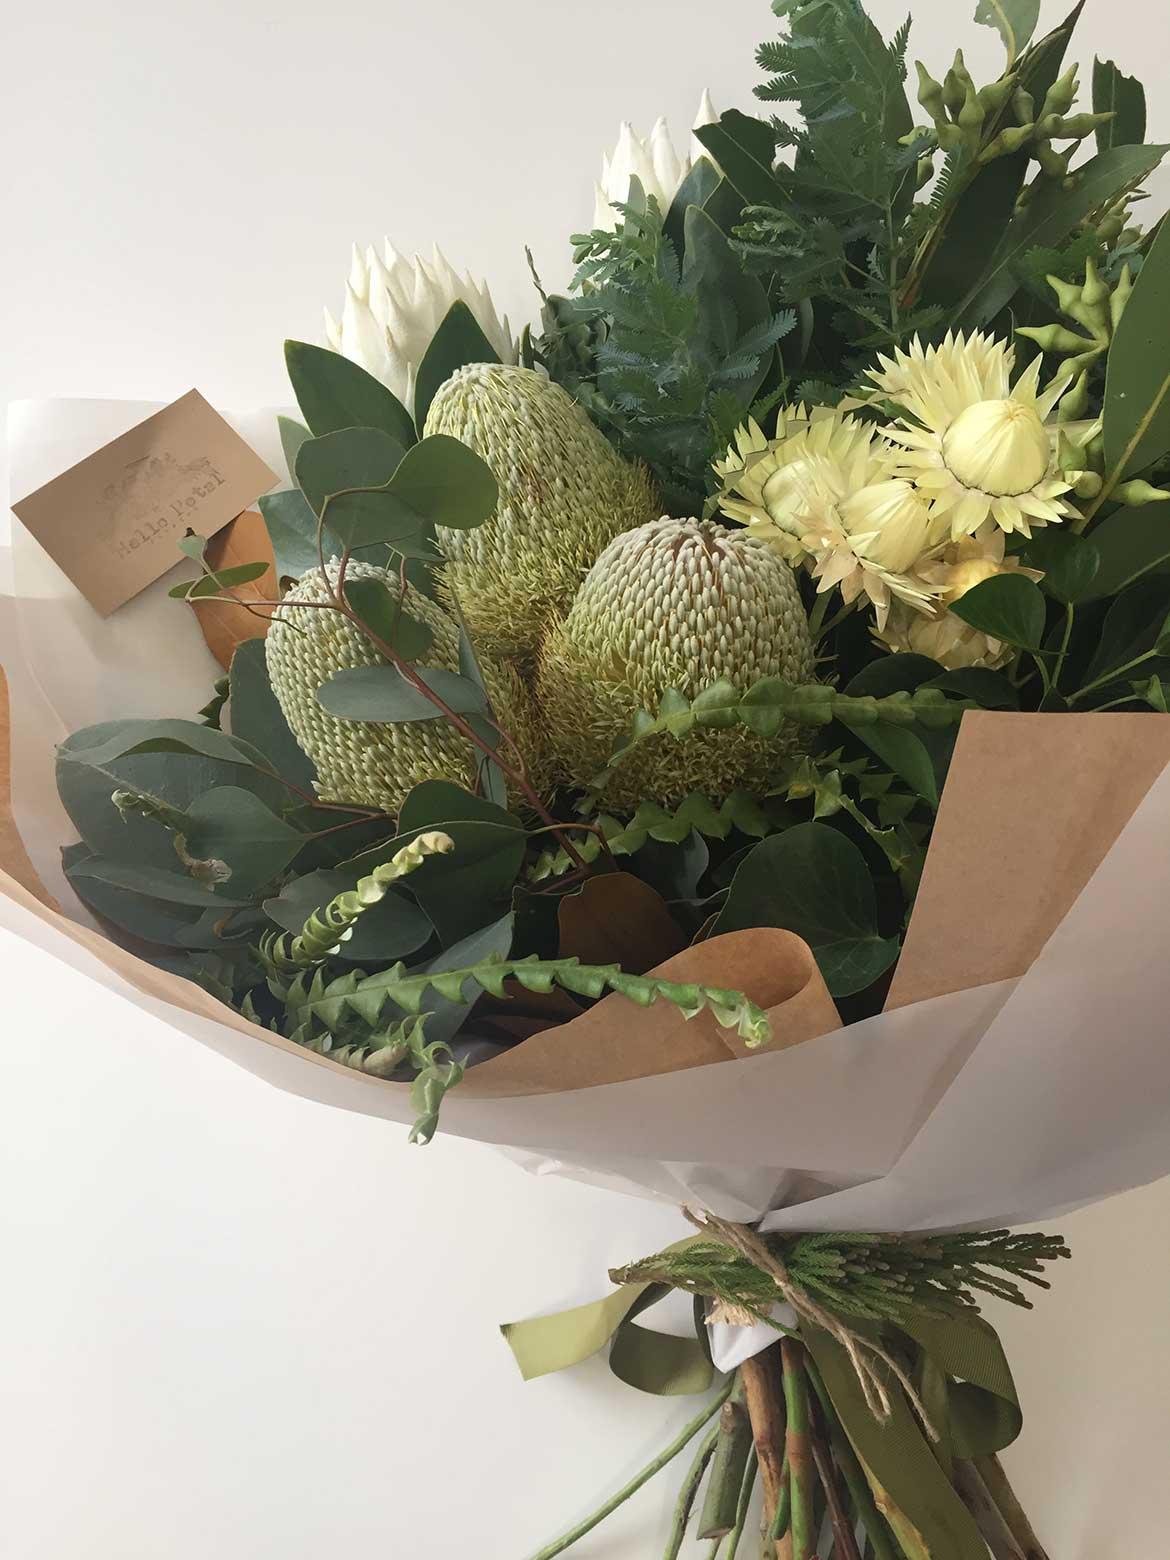 Bouquet of Australian native flowers.